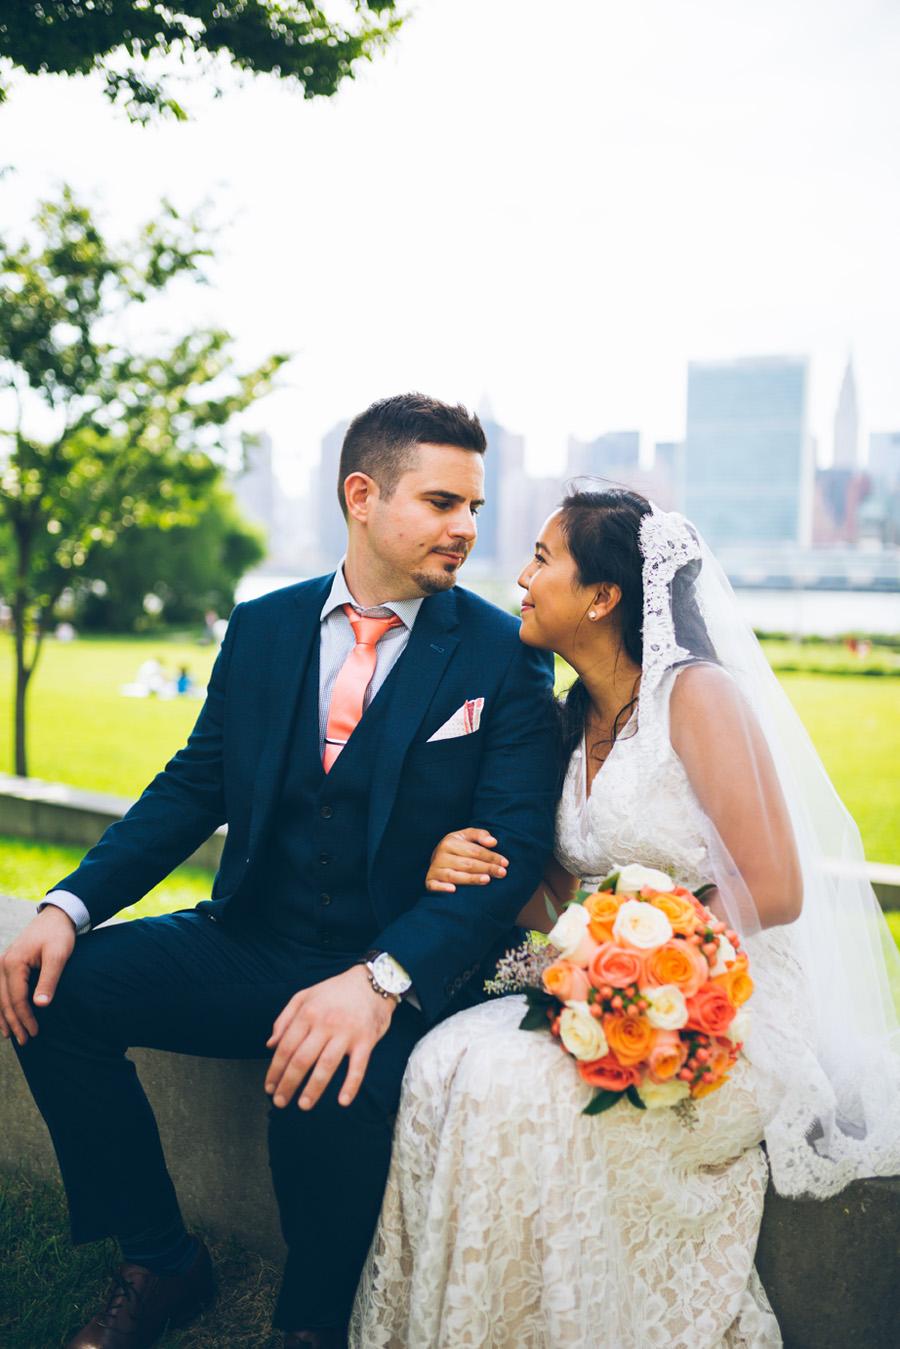 POOH-PETER-NYC-WEDDING-BRIDEGROOM-CYNTHIACHUNG-0452.jpg